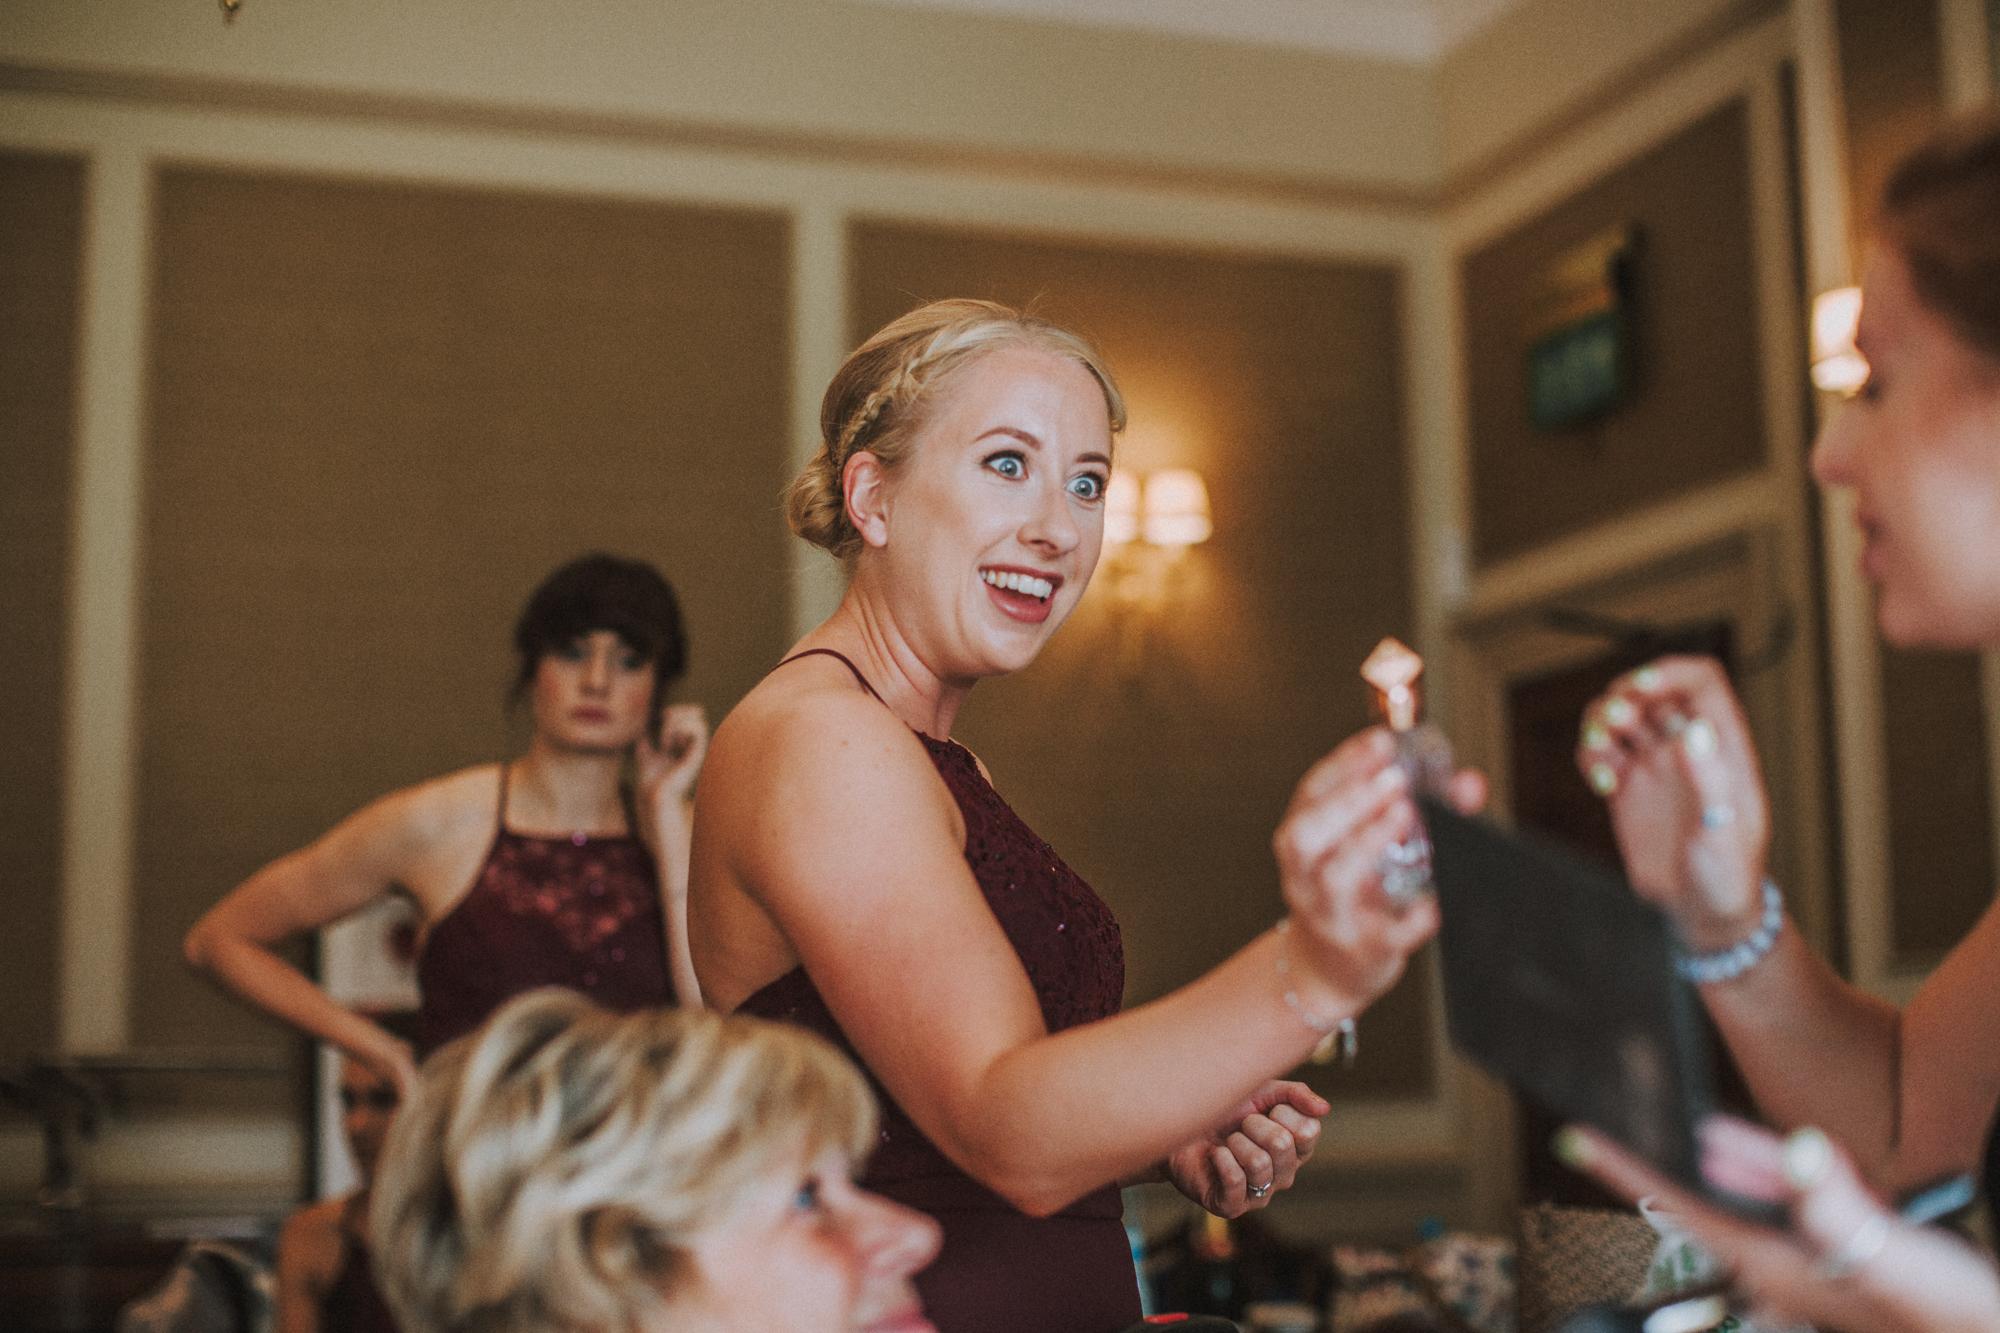 bowcliffe hall wedding photographers yorkshire-19.jpg